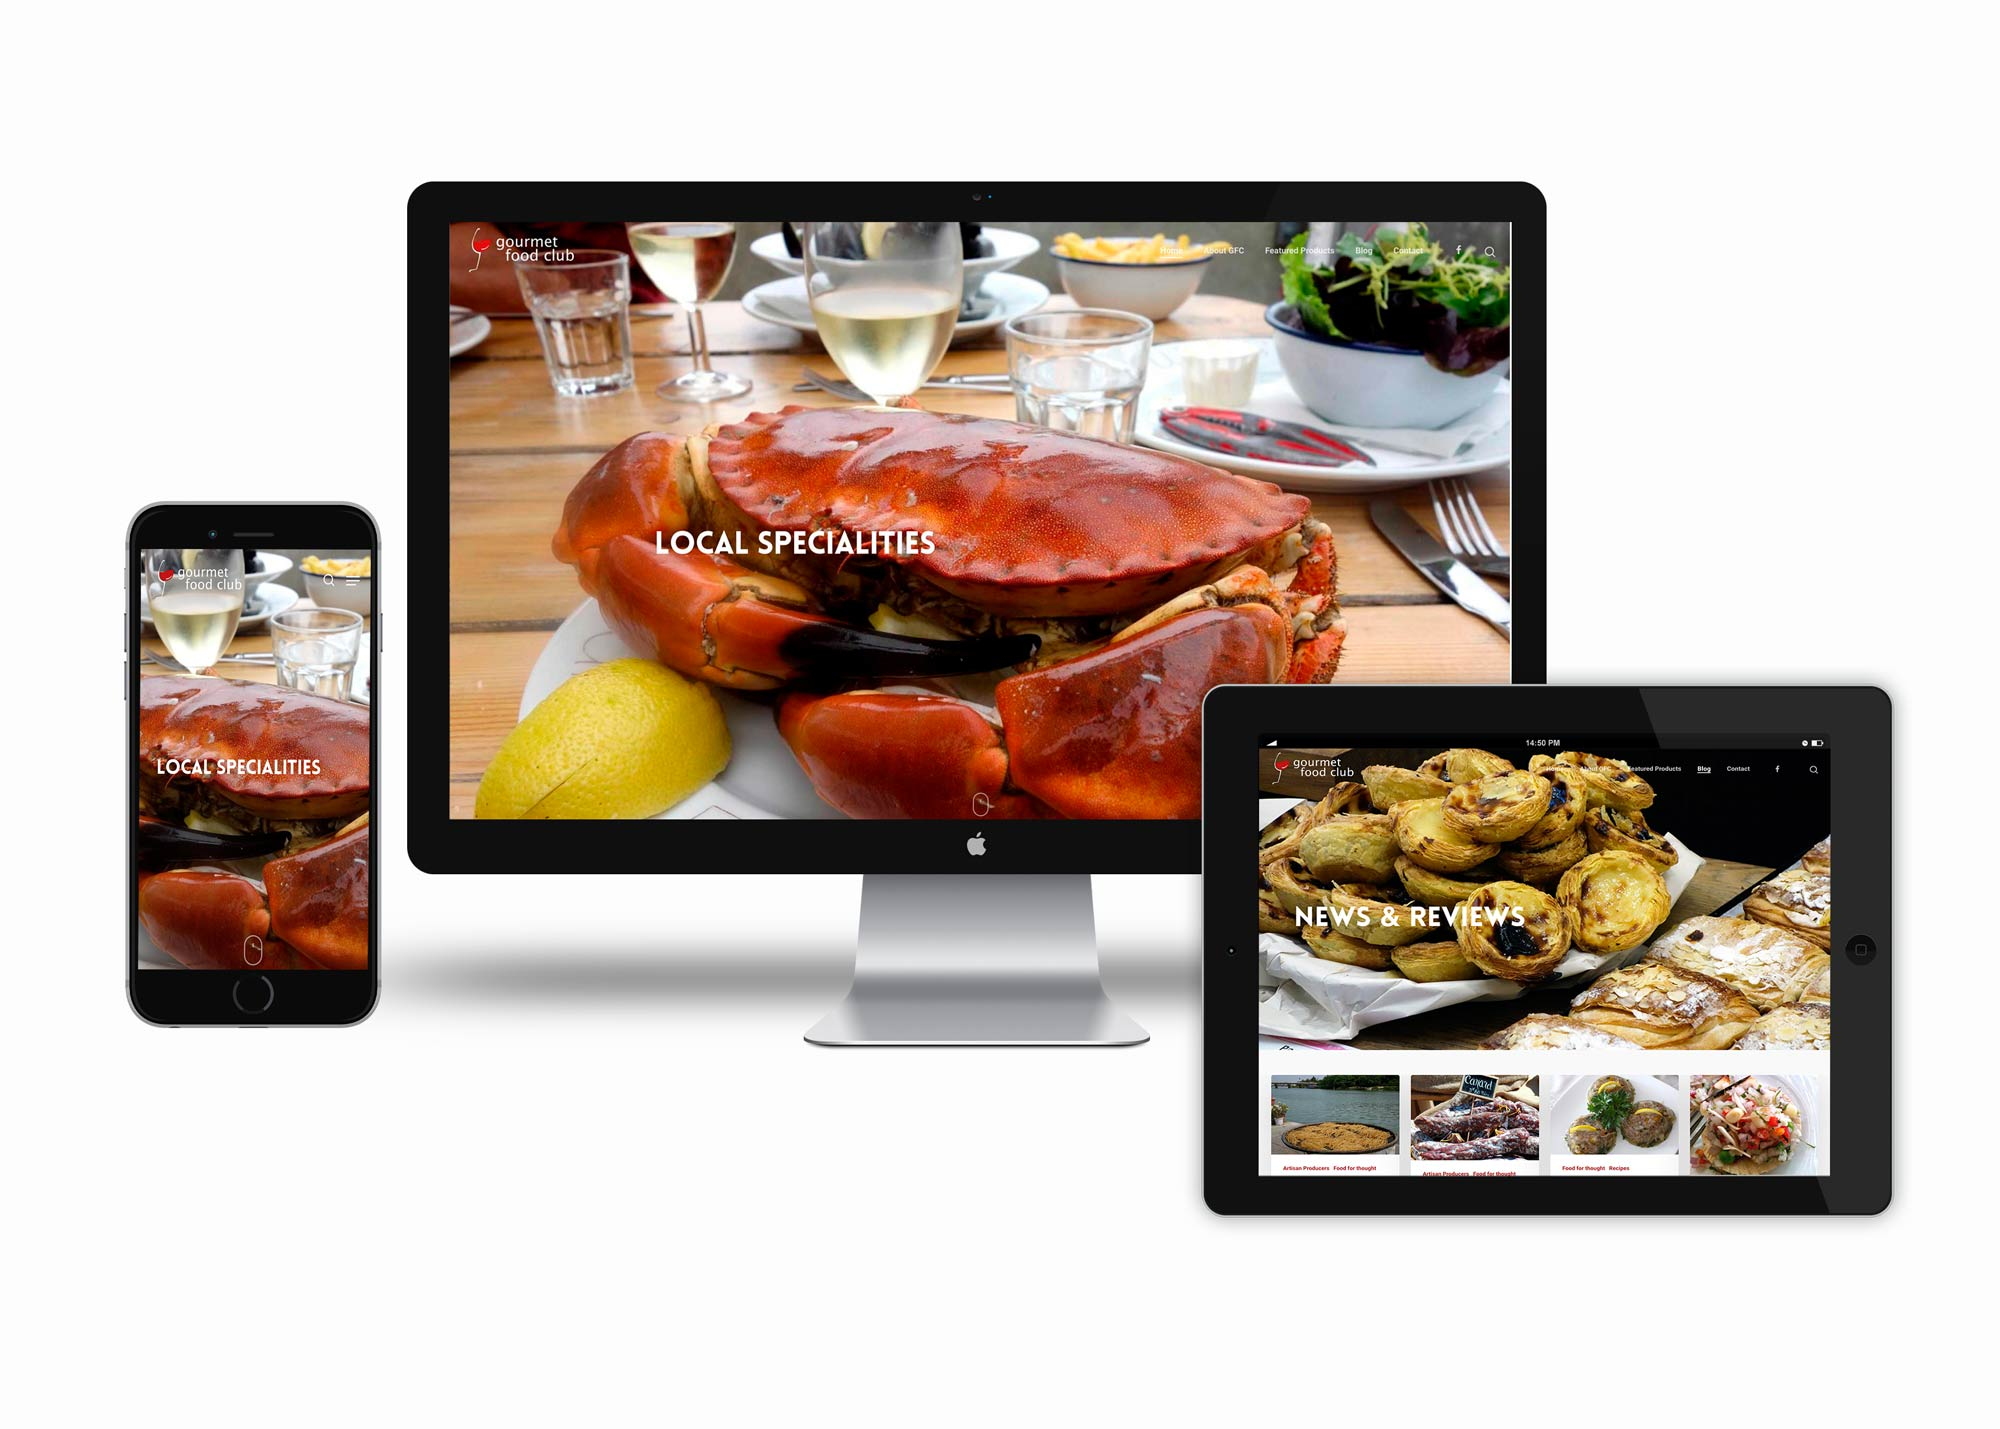 website development and design services